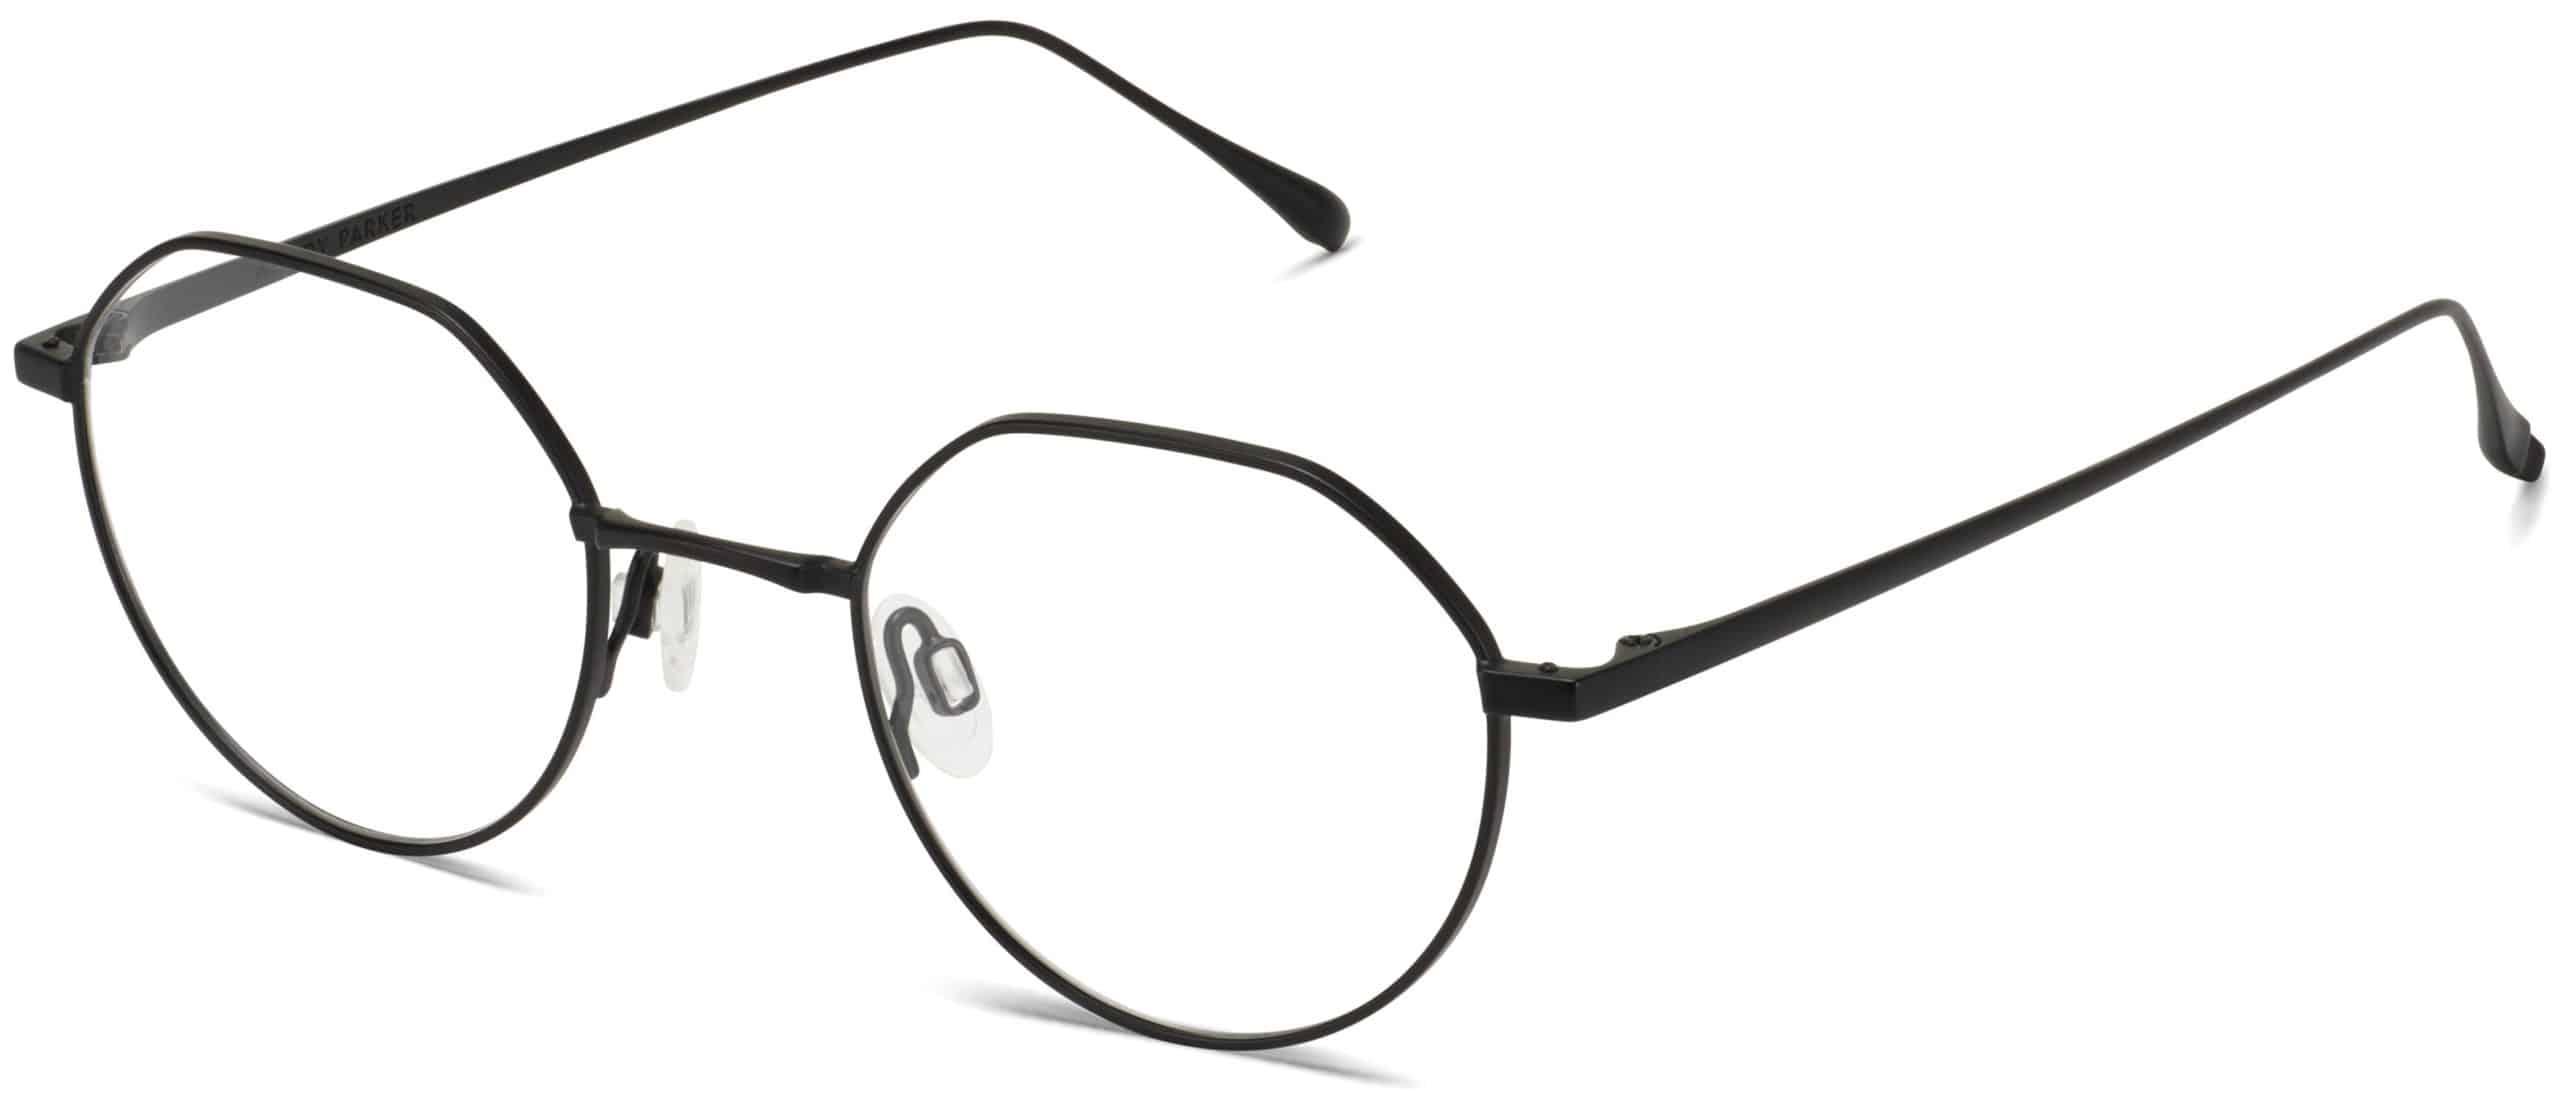 Gavin Eyeglasses Review - Warby Parker - Brushed Ink - 46-21-145 - Women